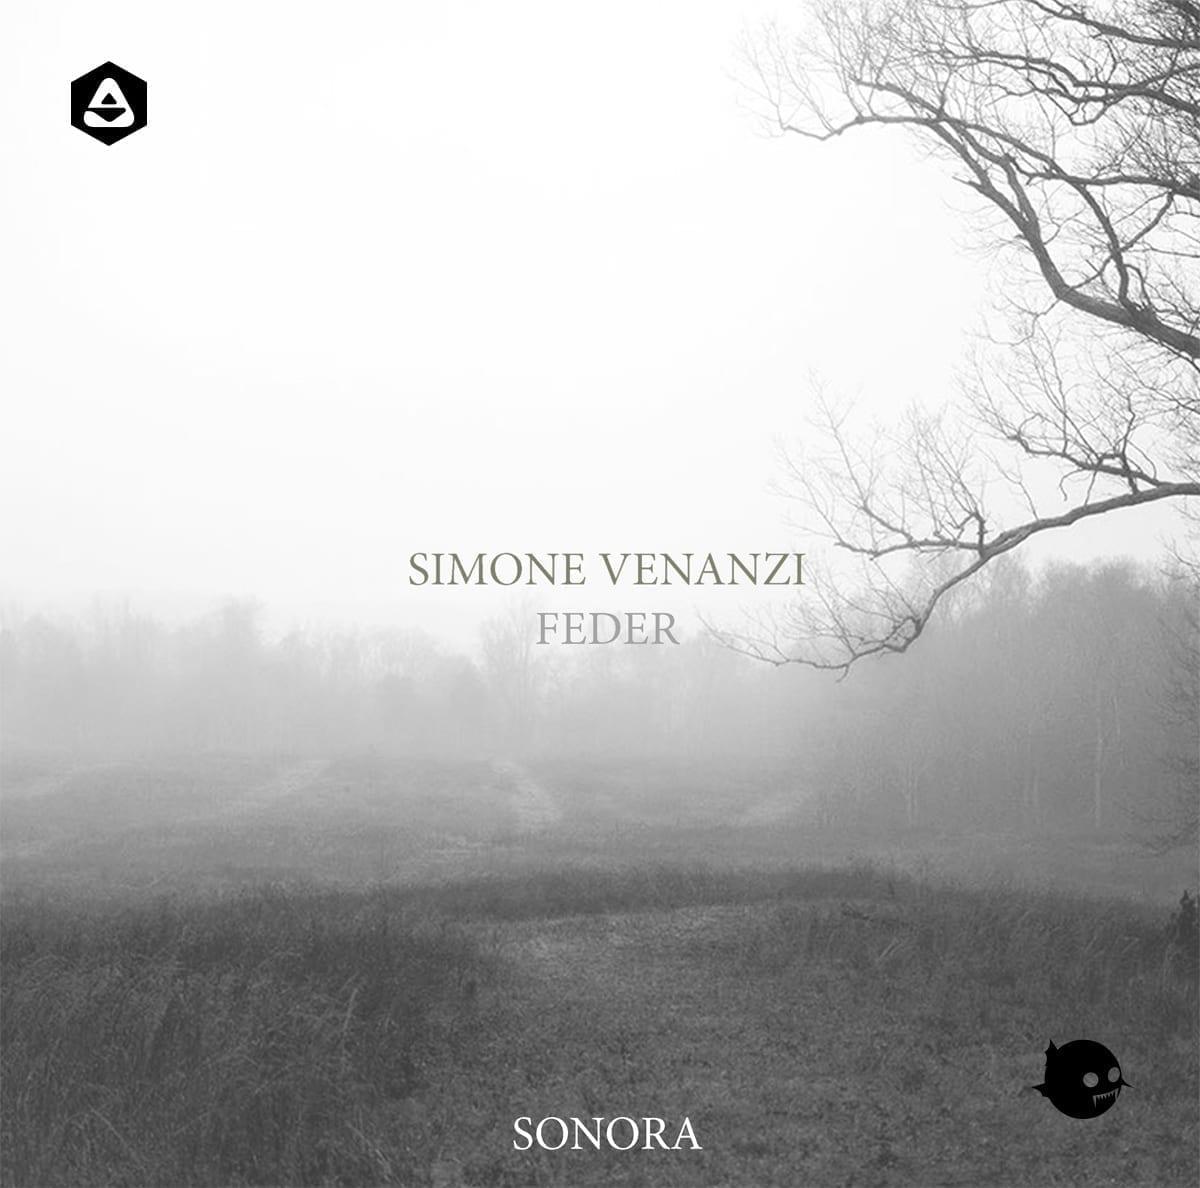 Simone Venanzi - Feder (Christian Burkhardt Remix) [Sonora Records] 01